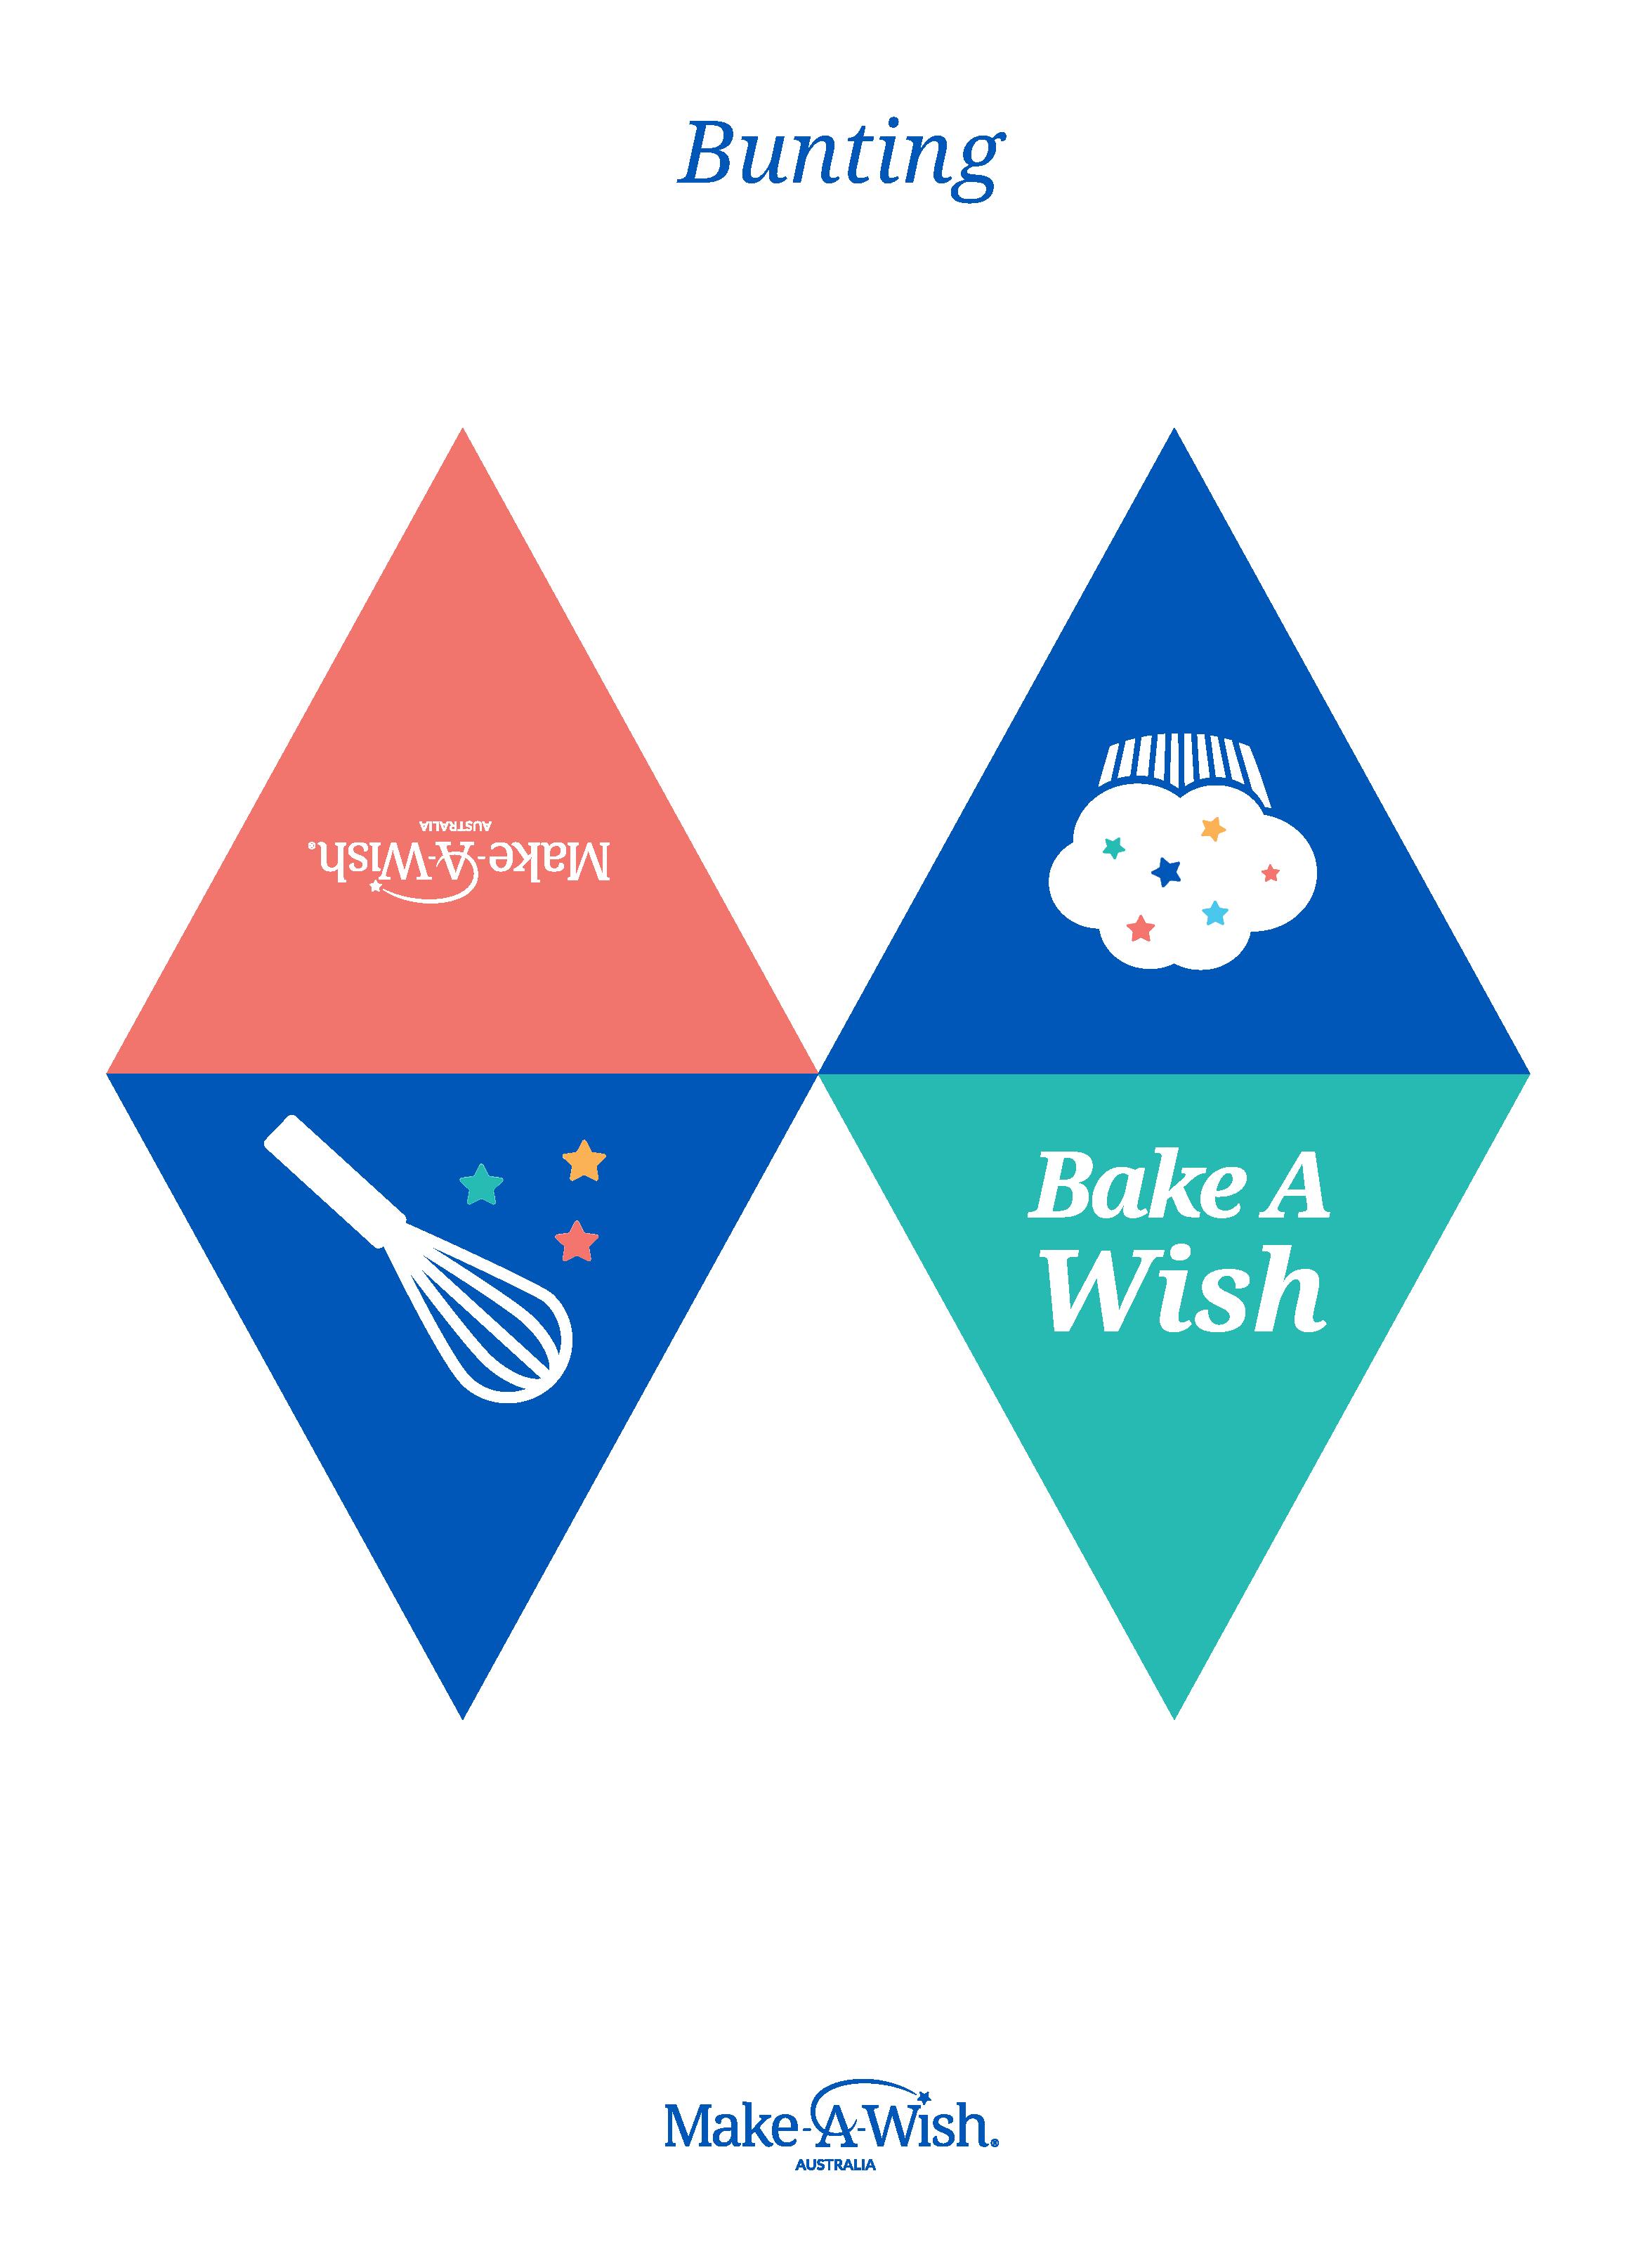 Bake A Wish Bunting